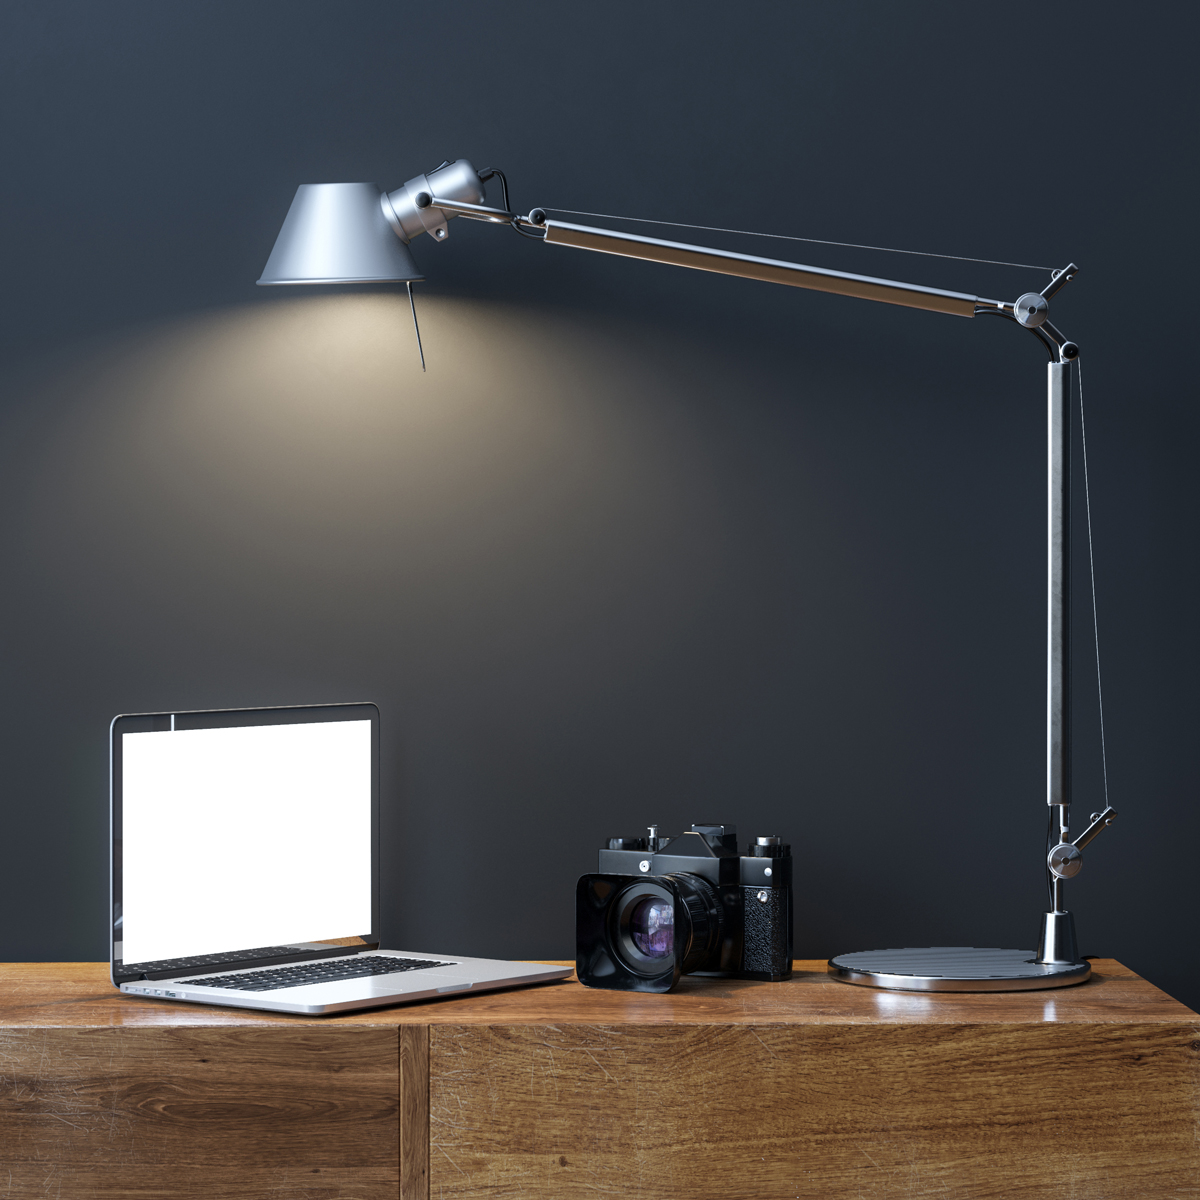 Artemide Tolomeo Desk Lamp - The Hunt For A Good Desk Lamp — Light My Nest